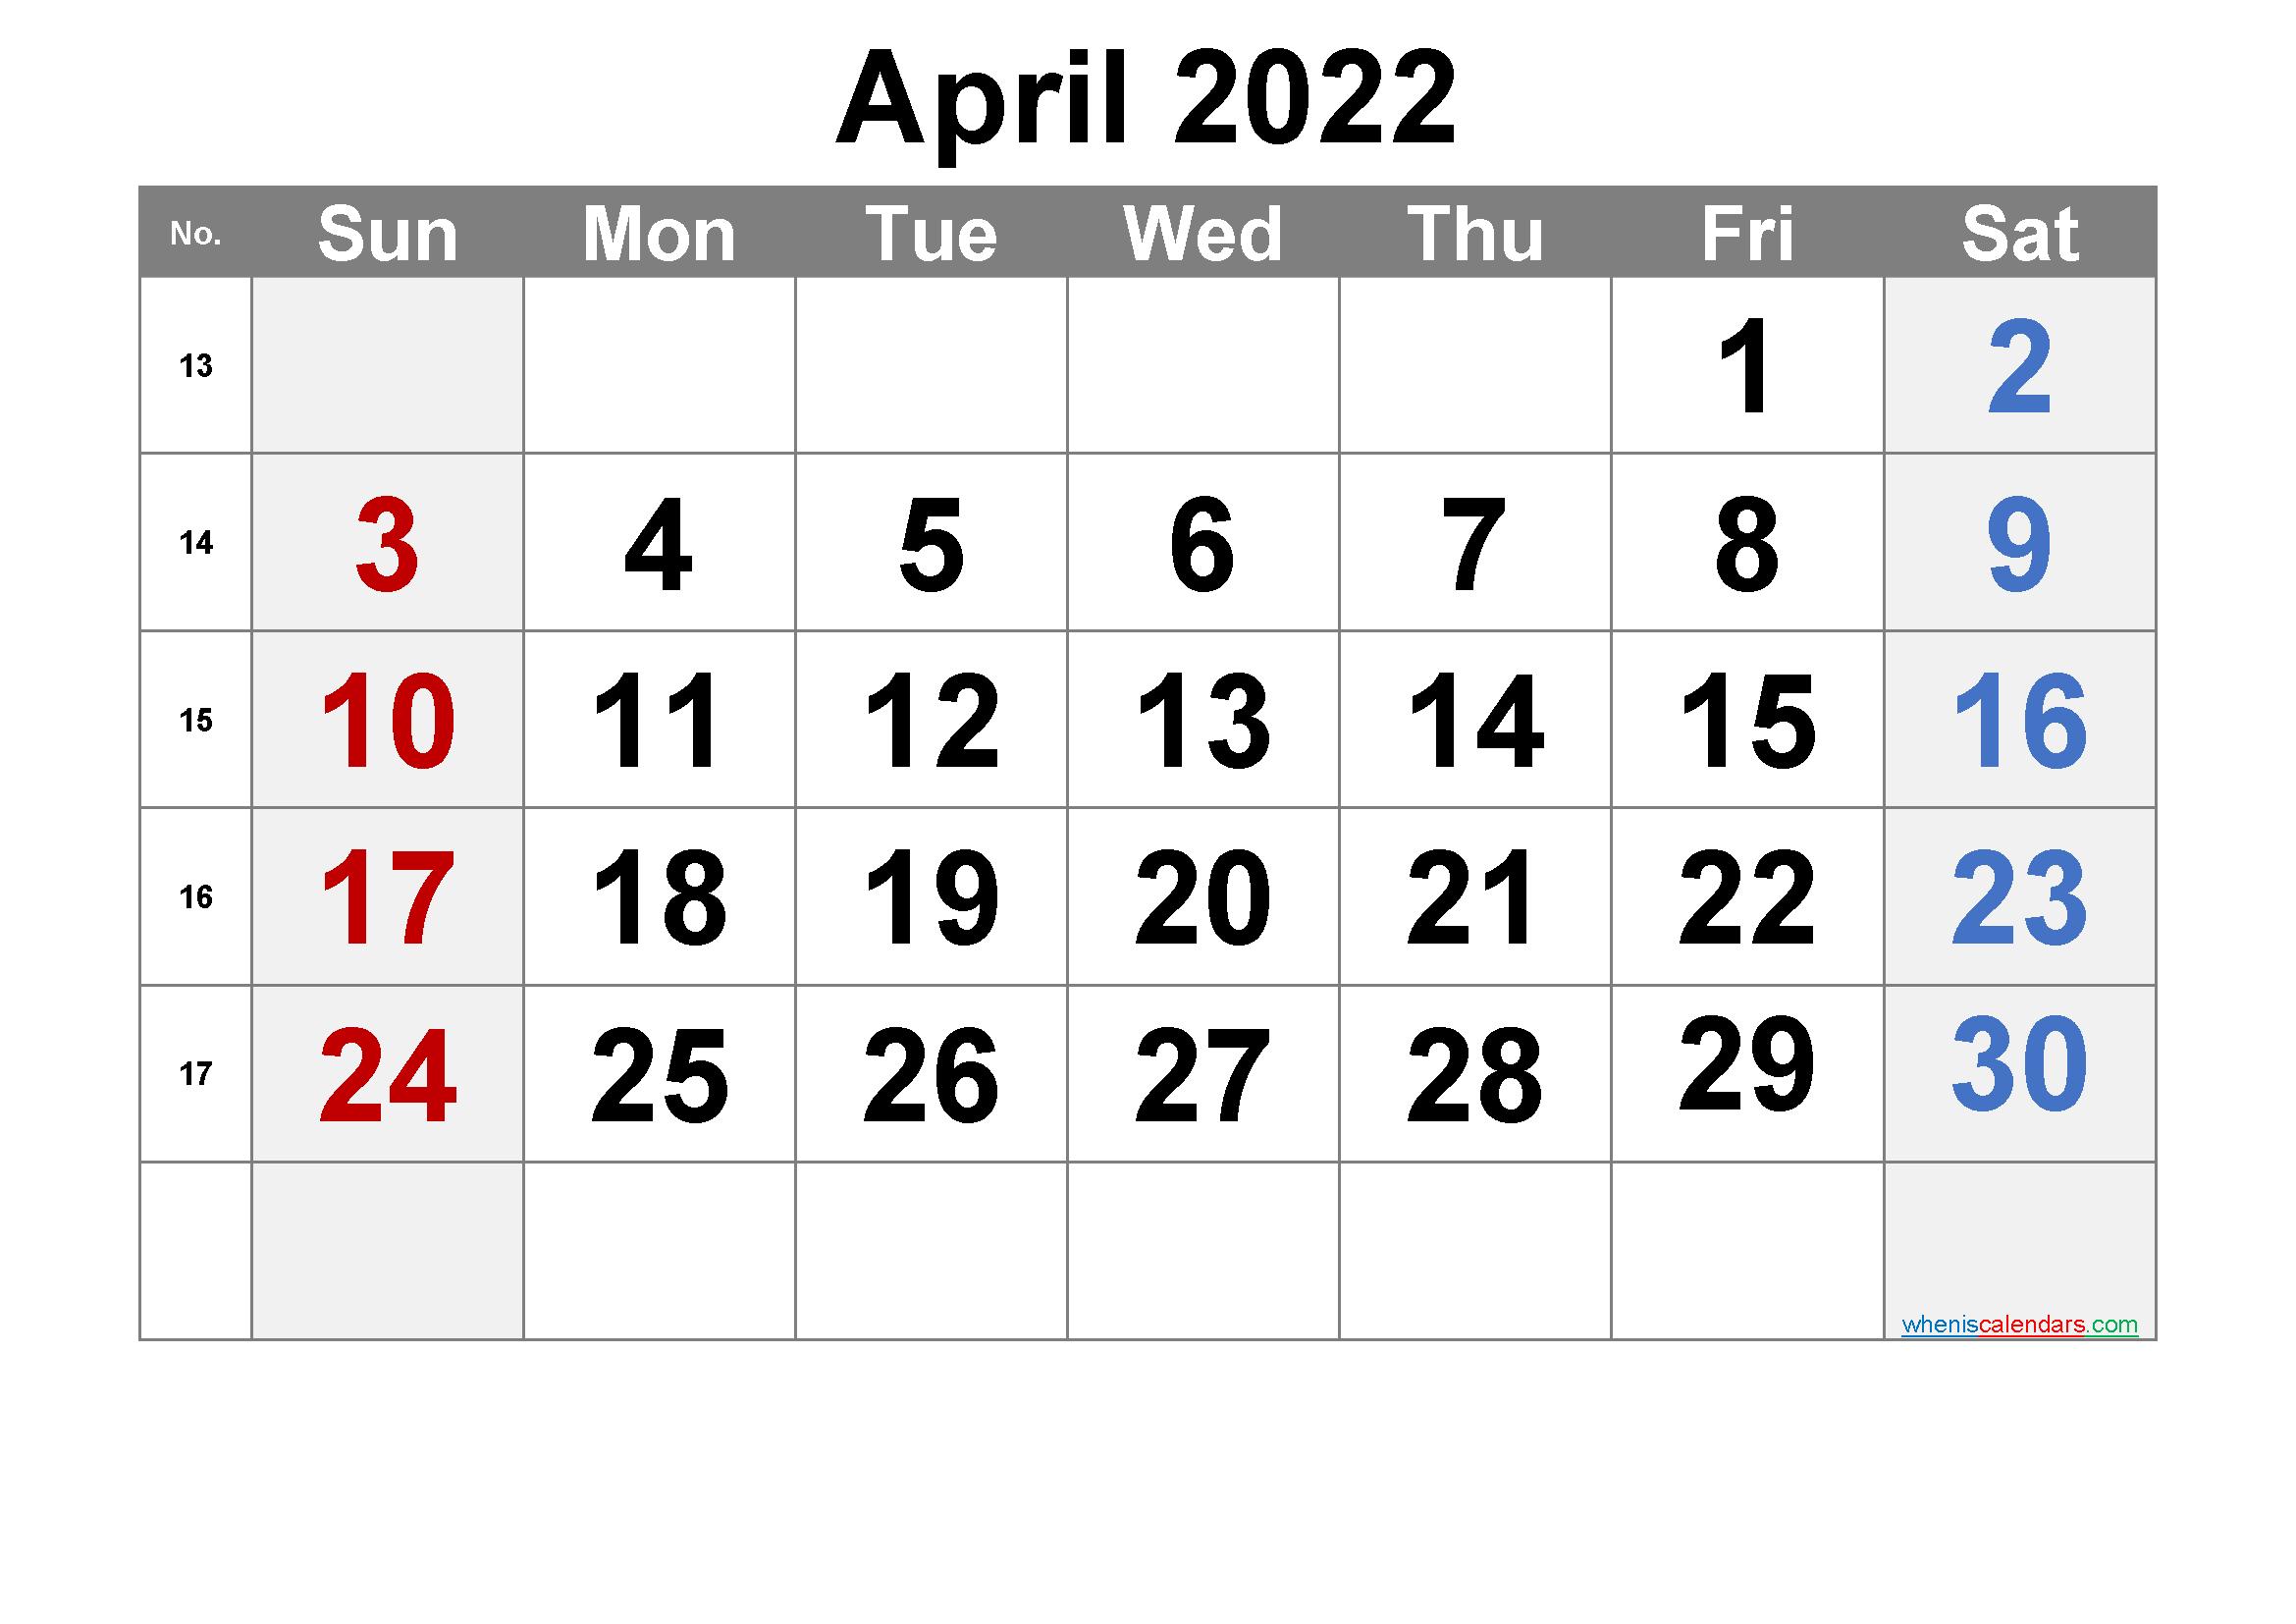 Apr 2022 Calendar.Free April 2022 Calendar Free Premium Calendar Printables Printable Calendar Template Free Printable Calendar